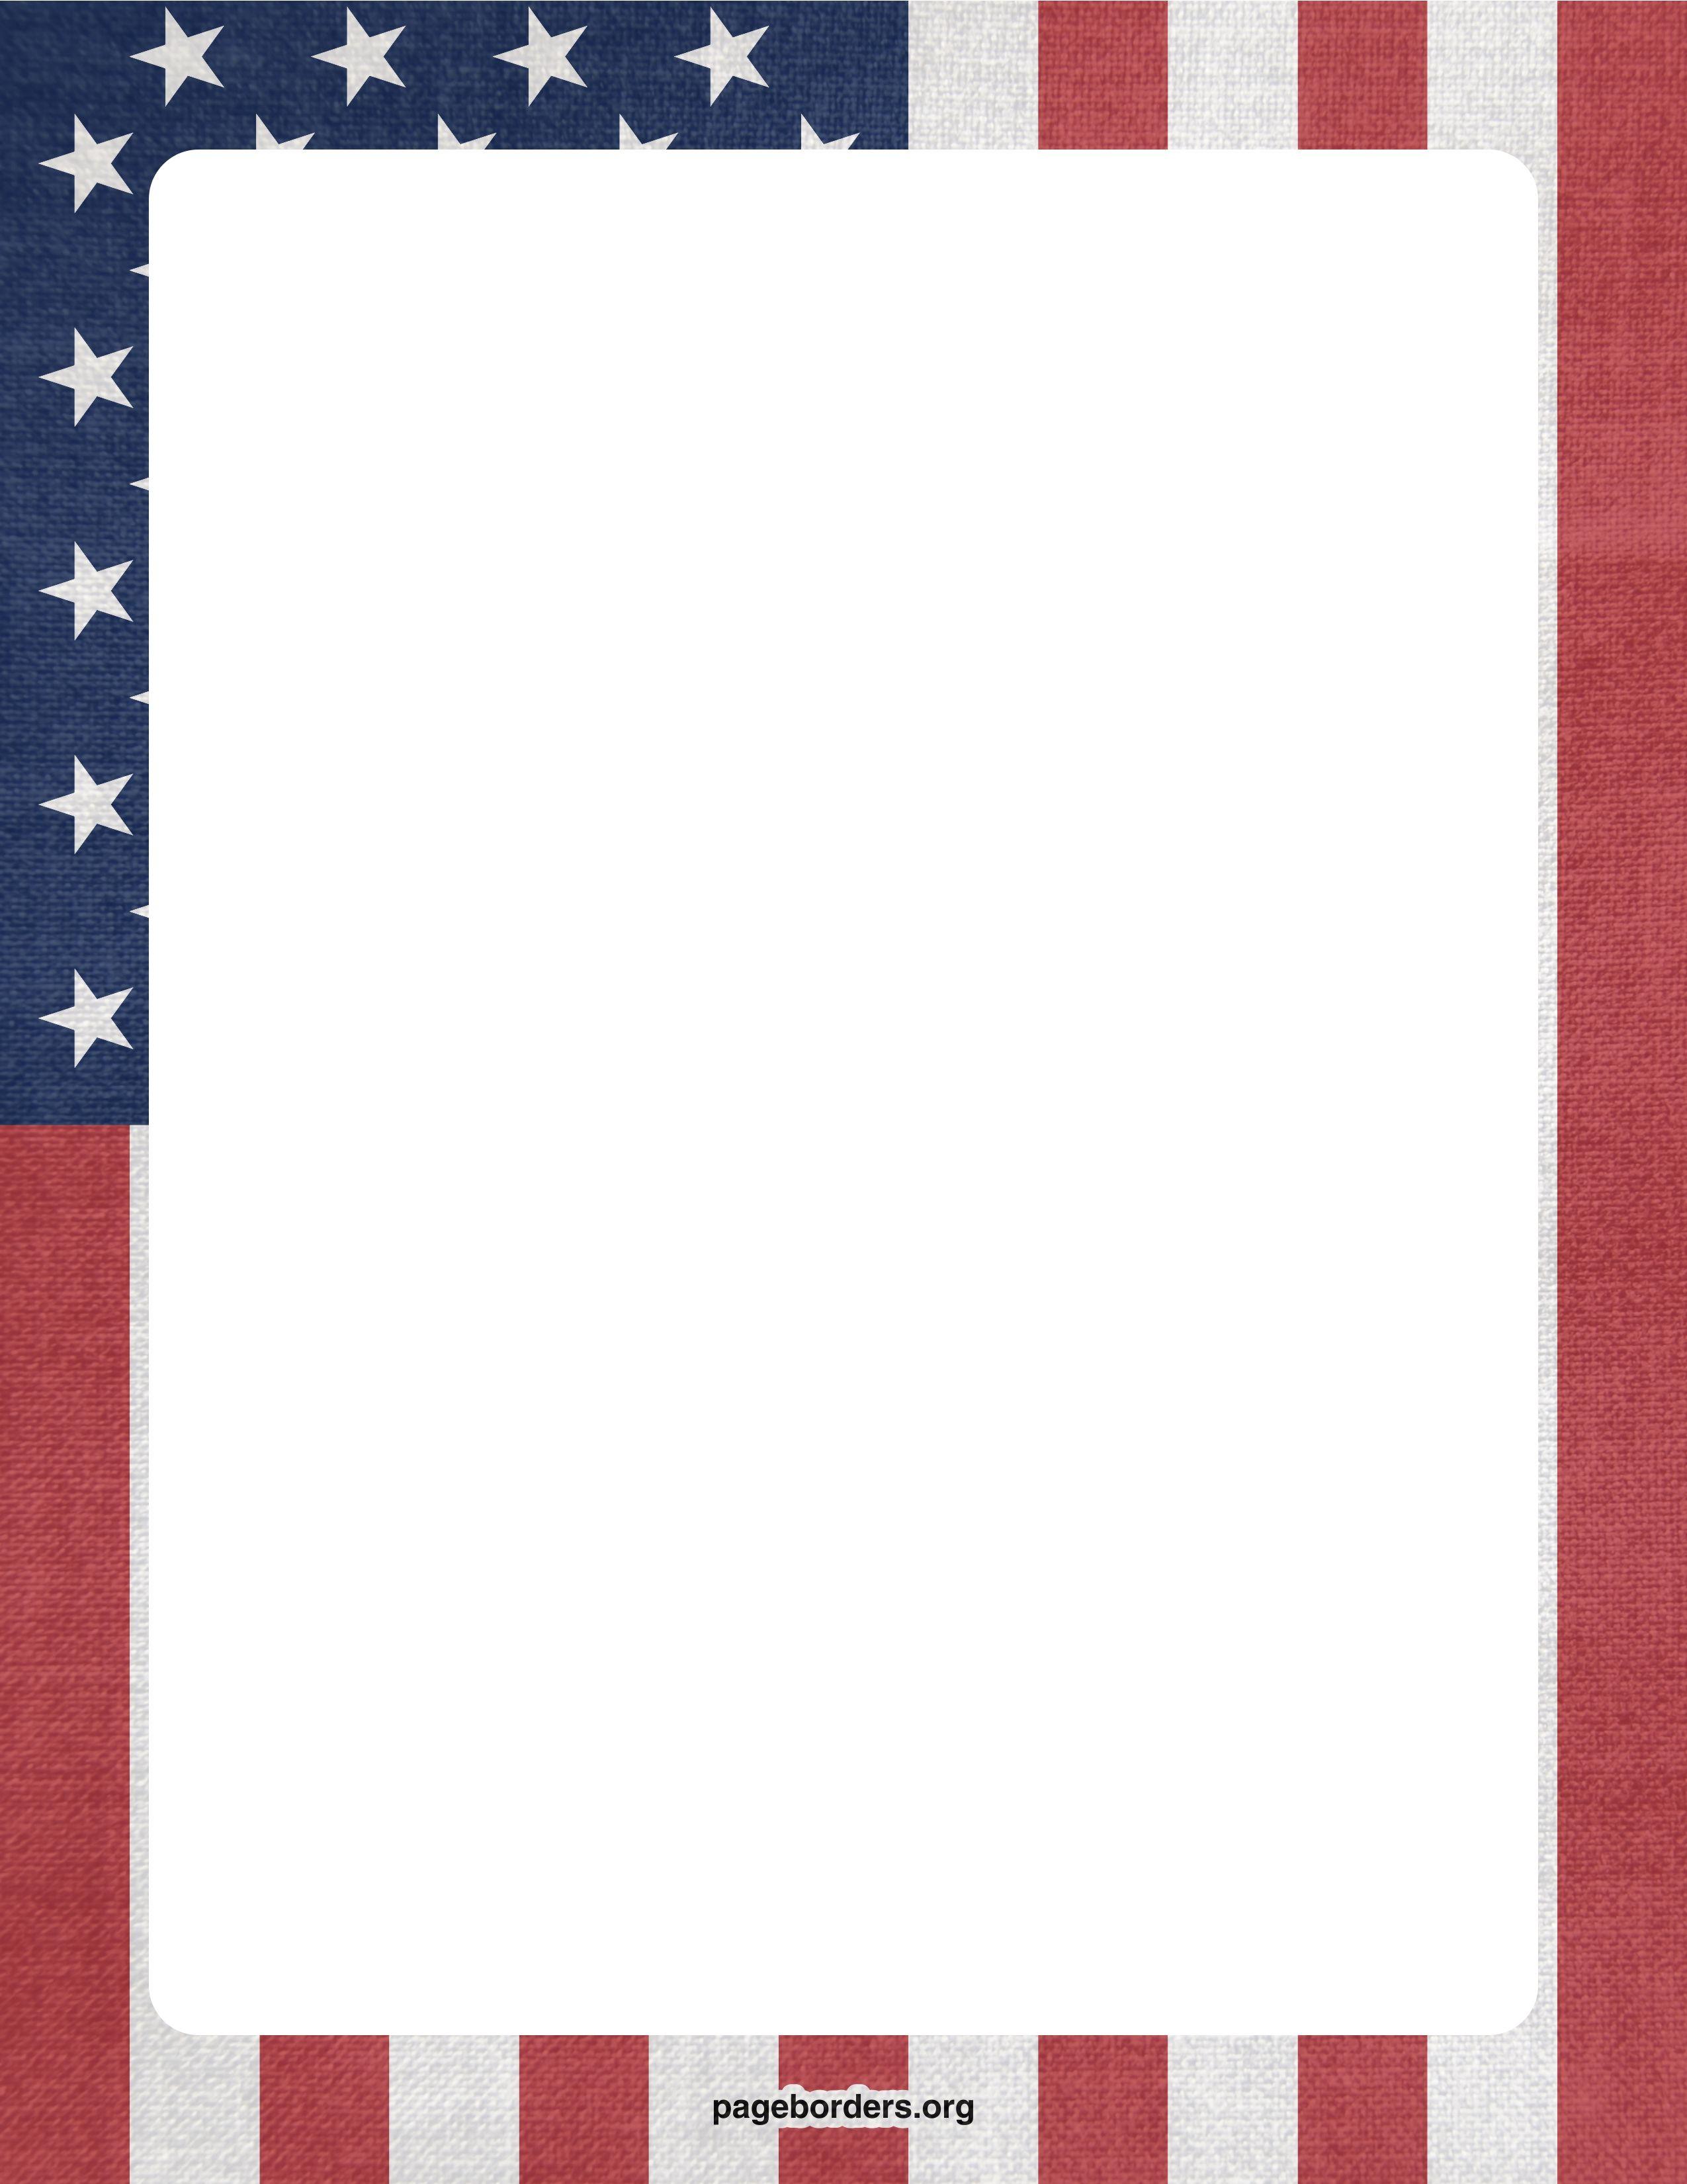 american-flag-border-watermarked.jpg (2550×3301) | frames ...